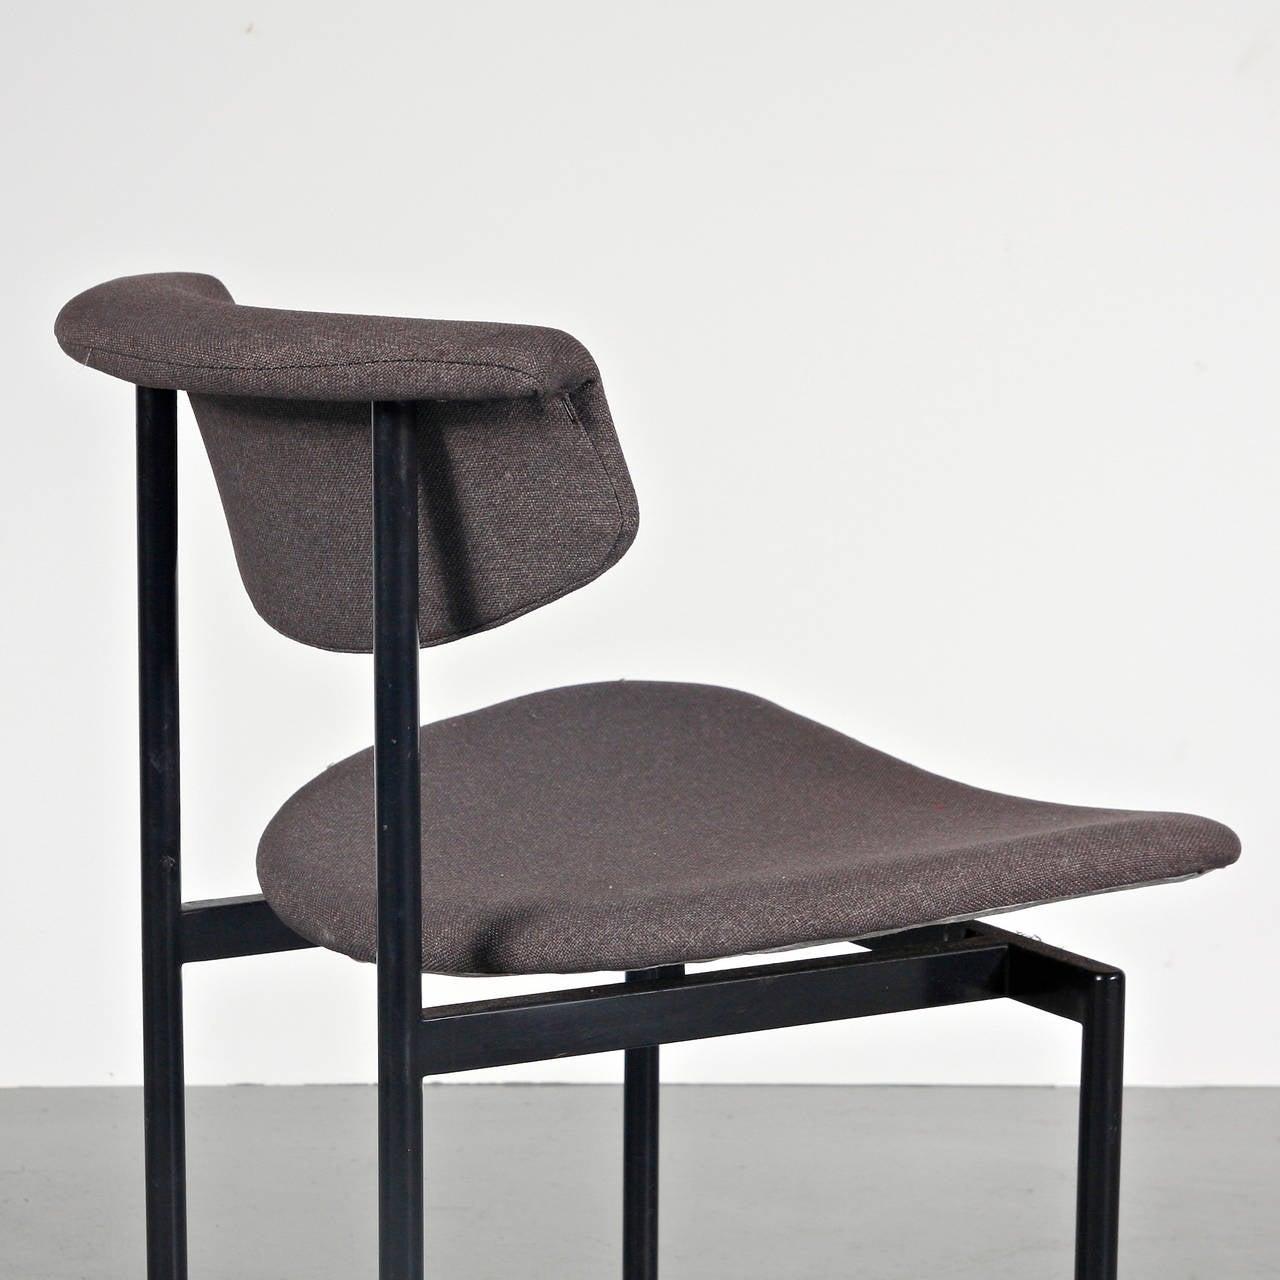 Foam Set of 8 Rudolf Wolf Dining Chairs, circa 1960